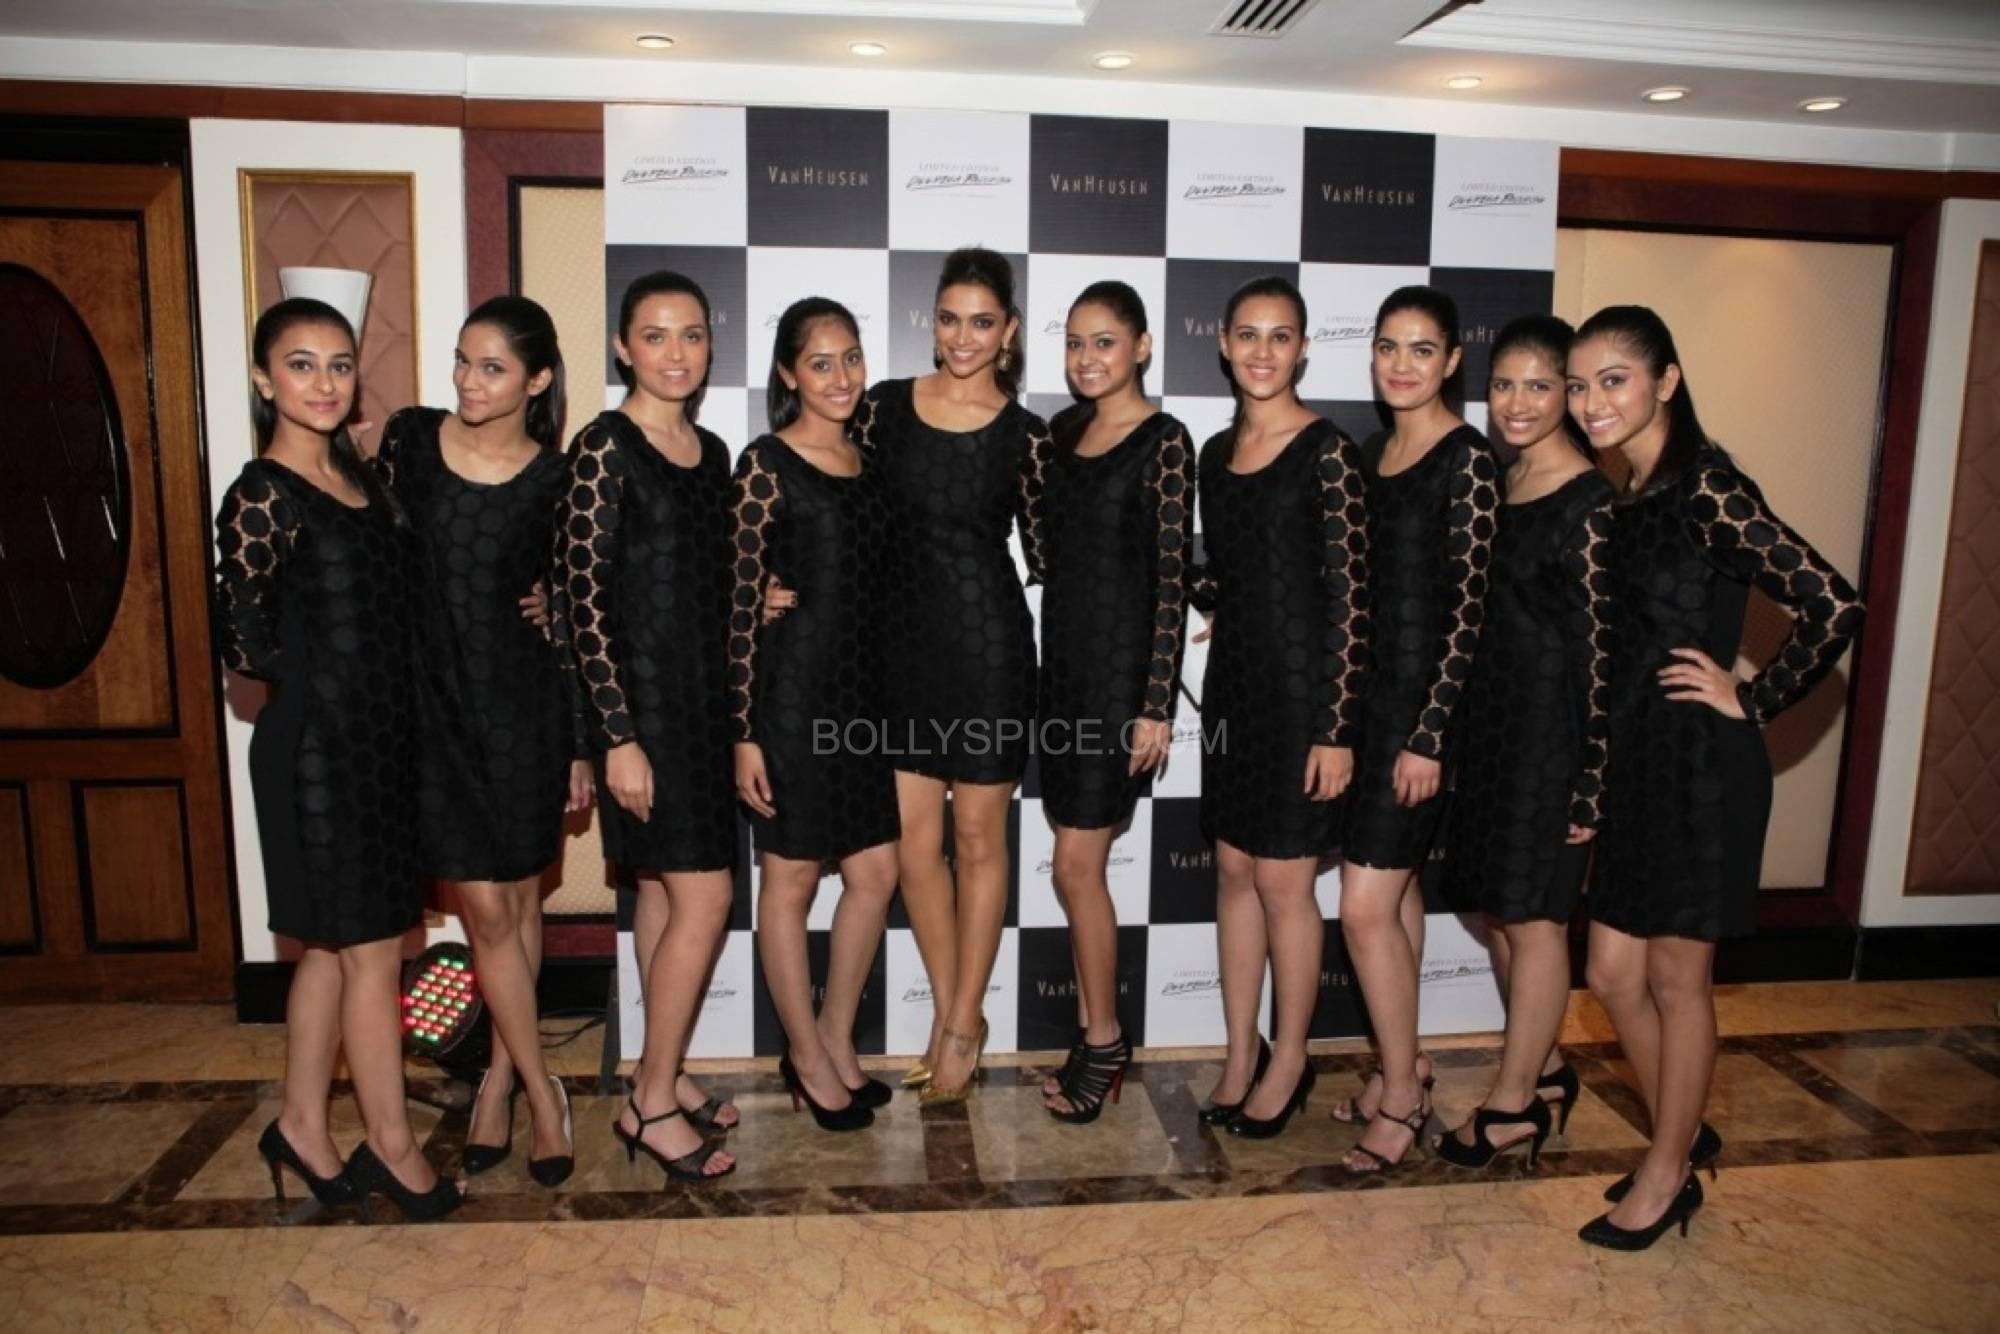 deepikapadukonefanfadhionshow5 Deepika Padukones Fans Fashion Show for Van Heusen